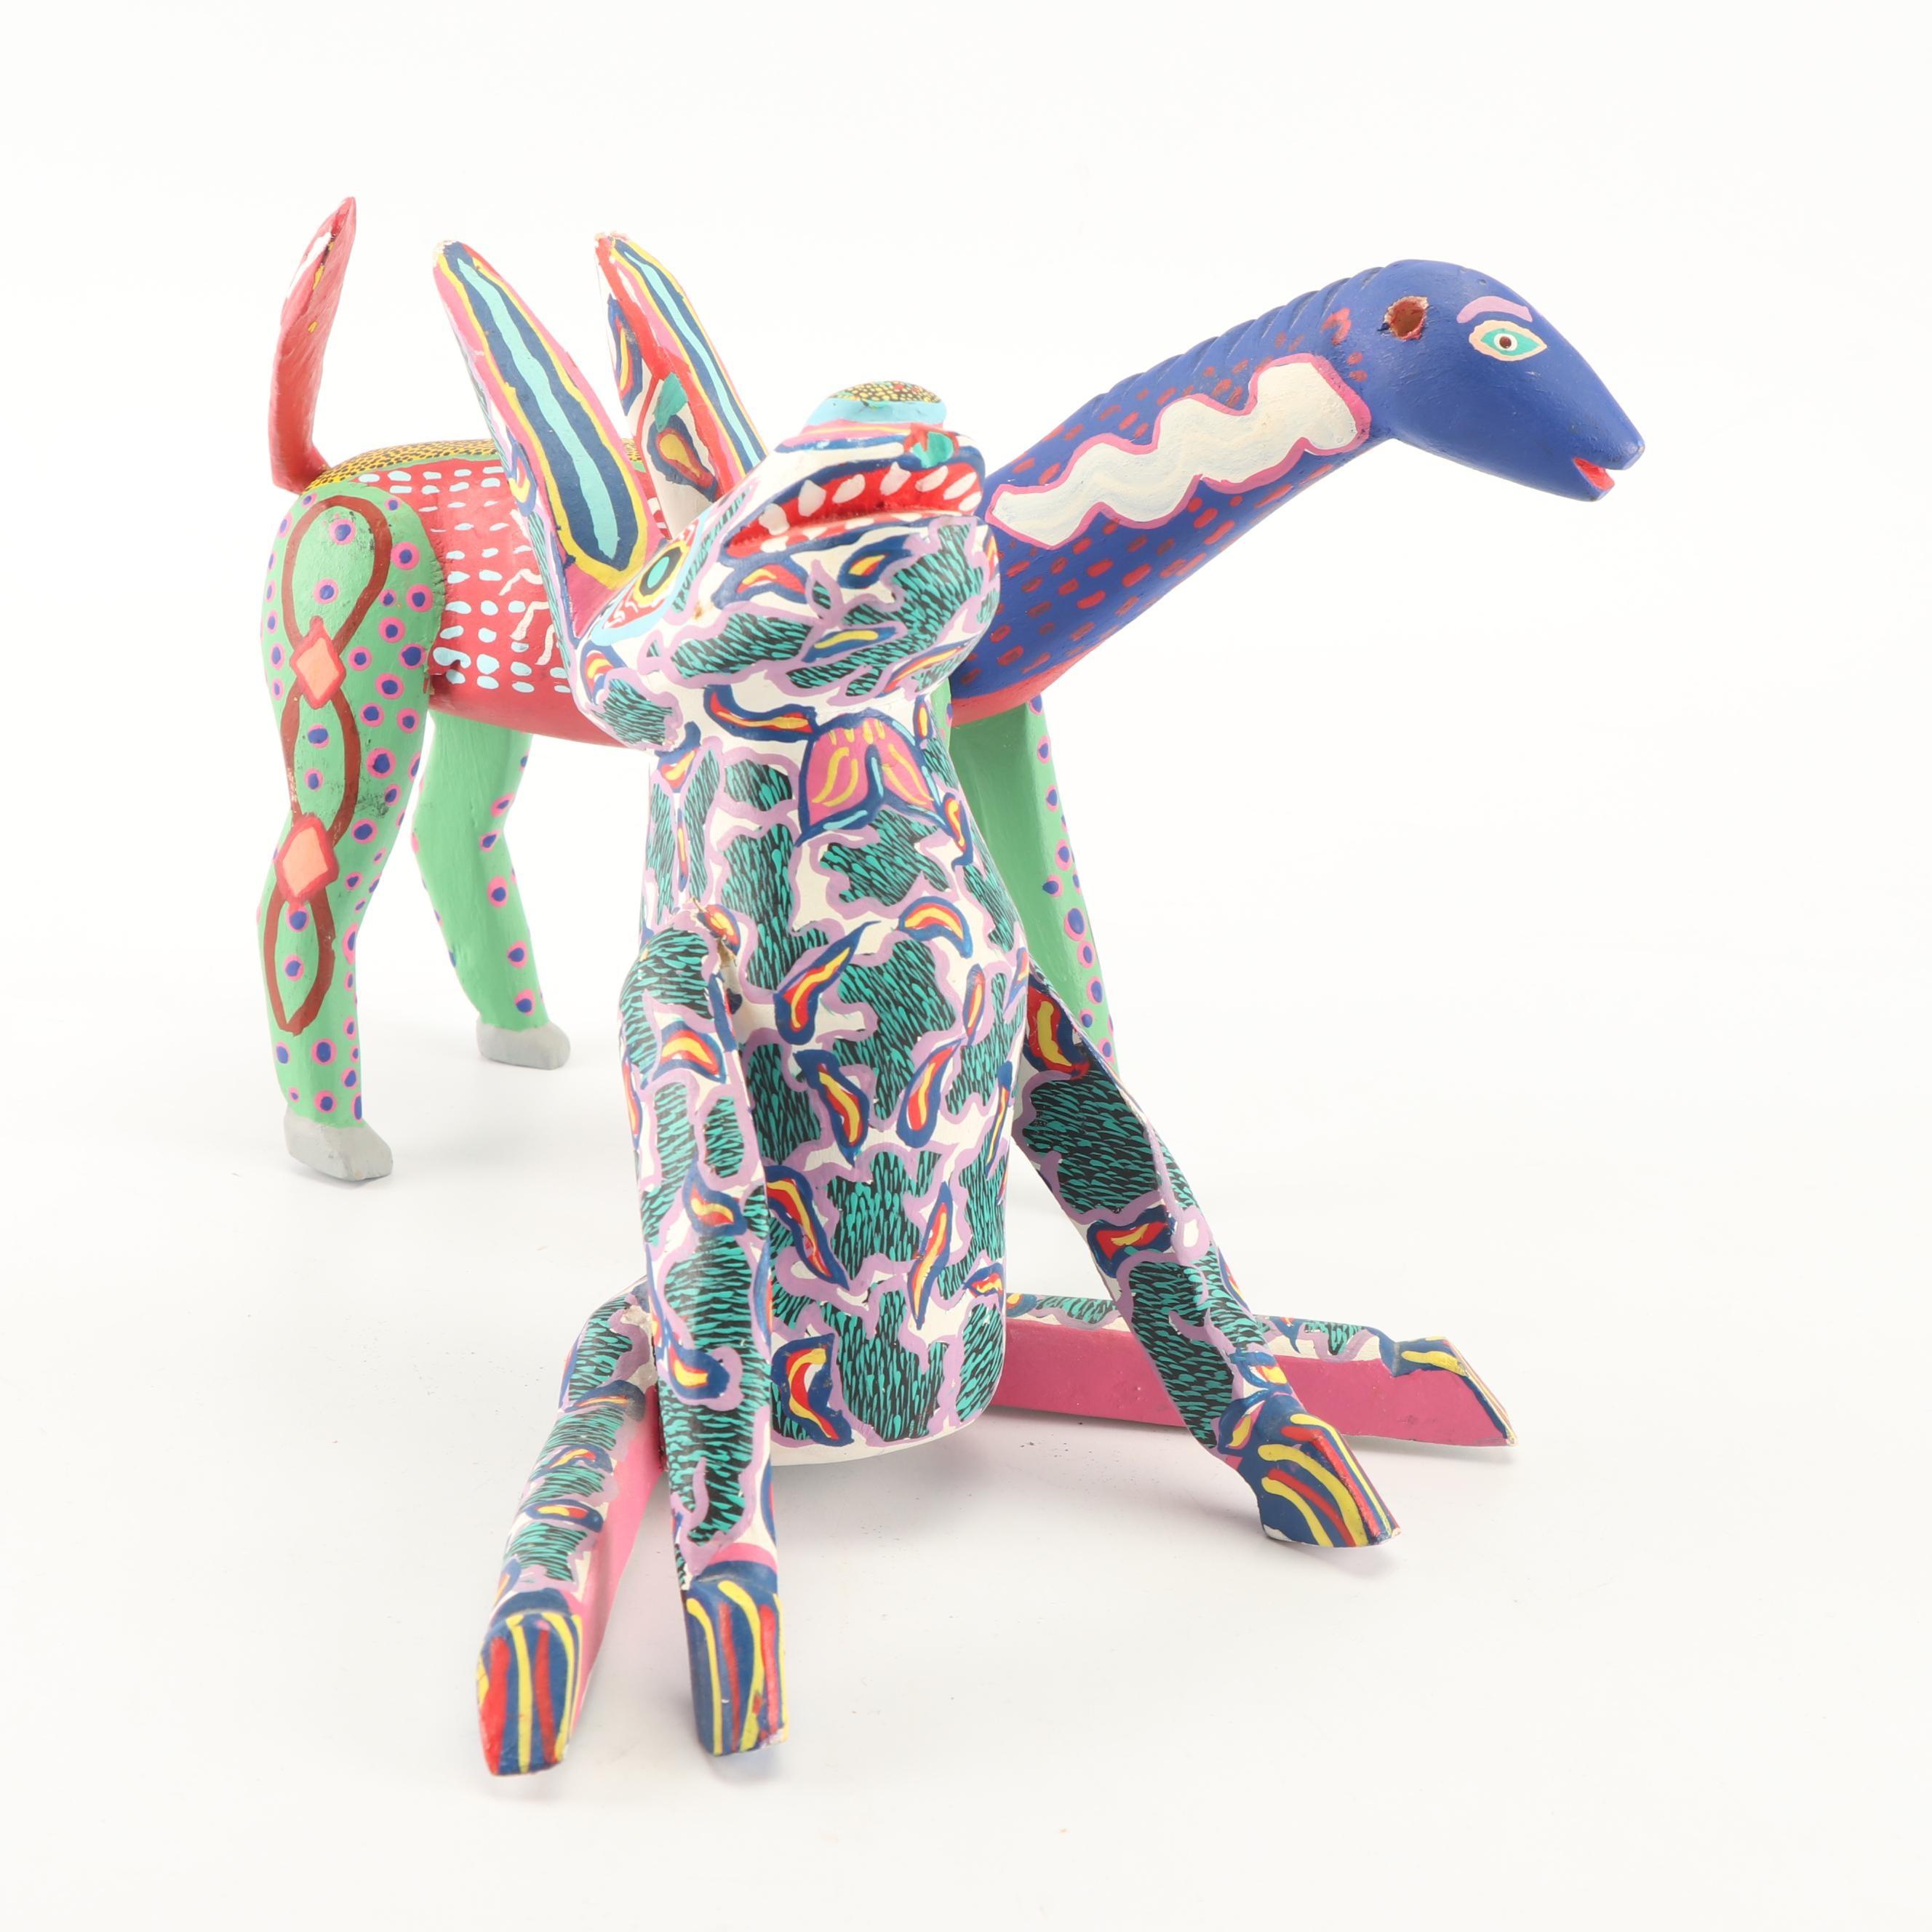 Mexican Folk Art Alebrijes Figurines